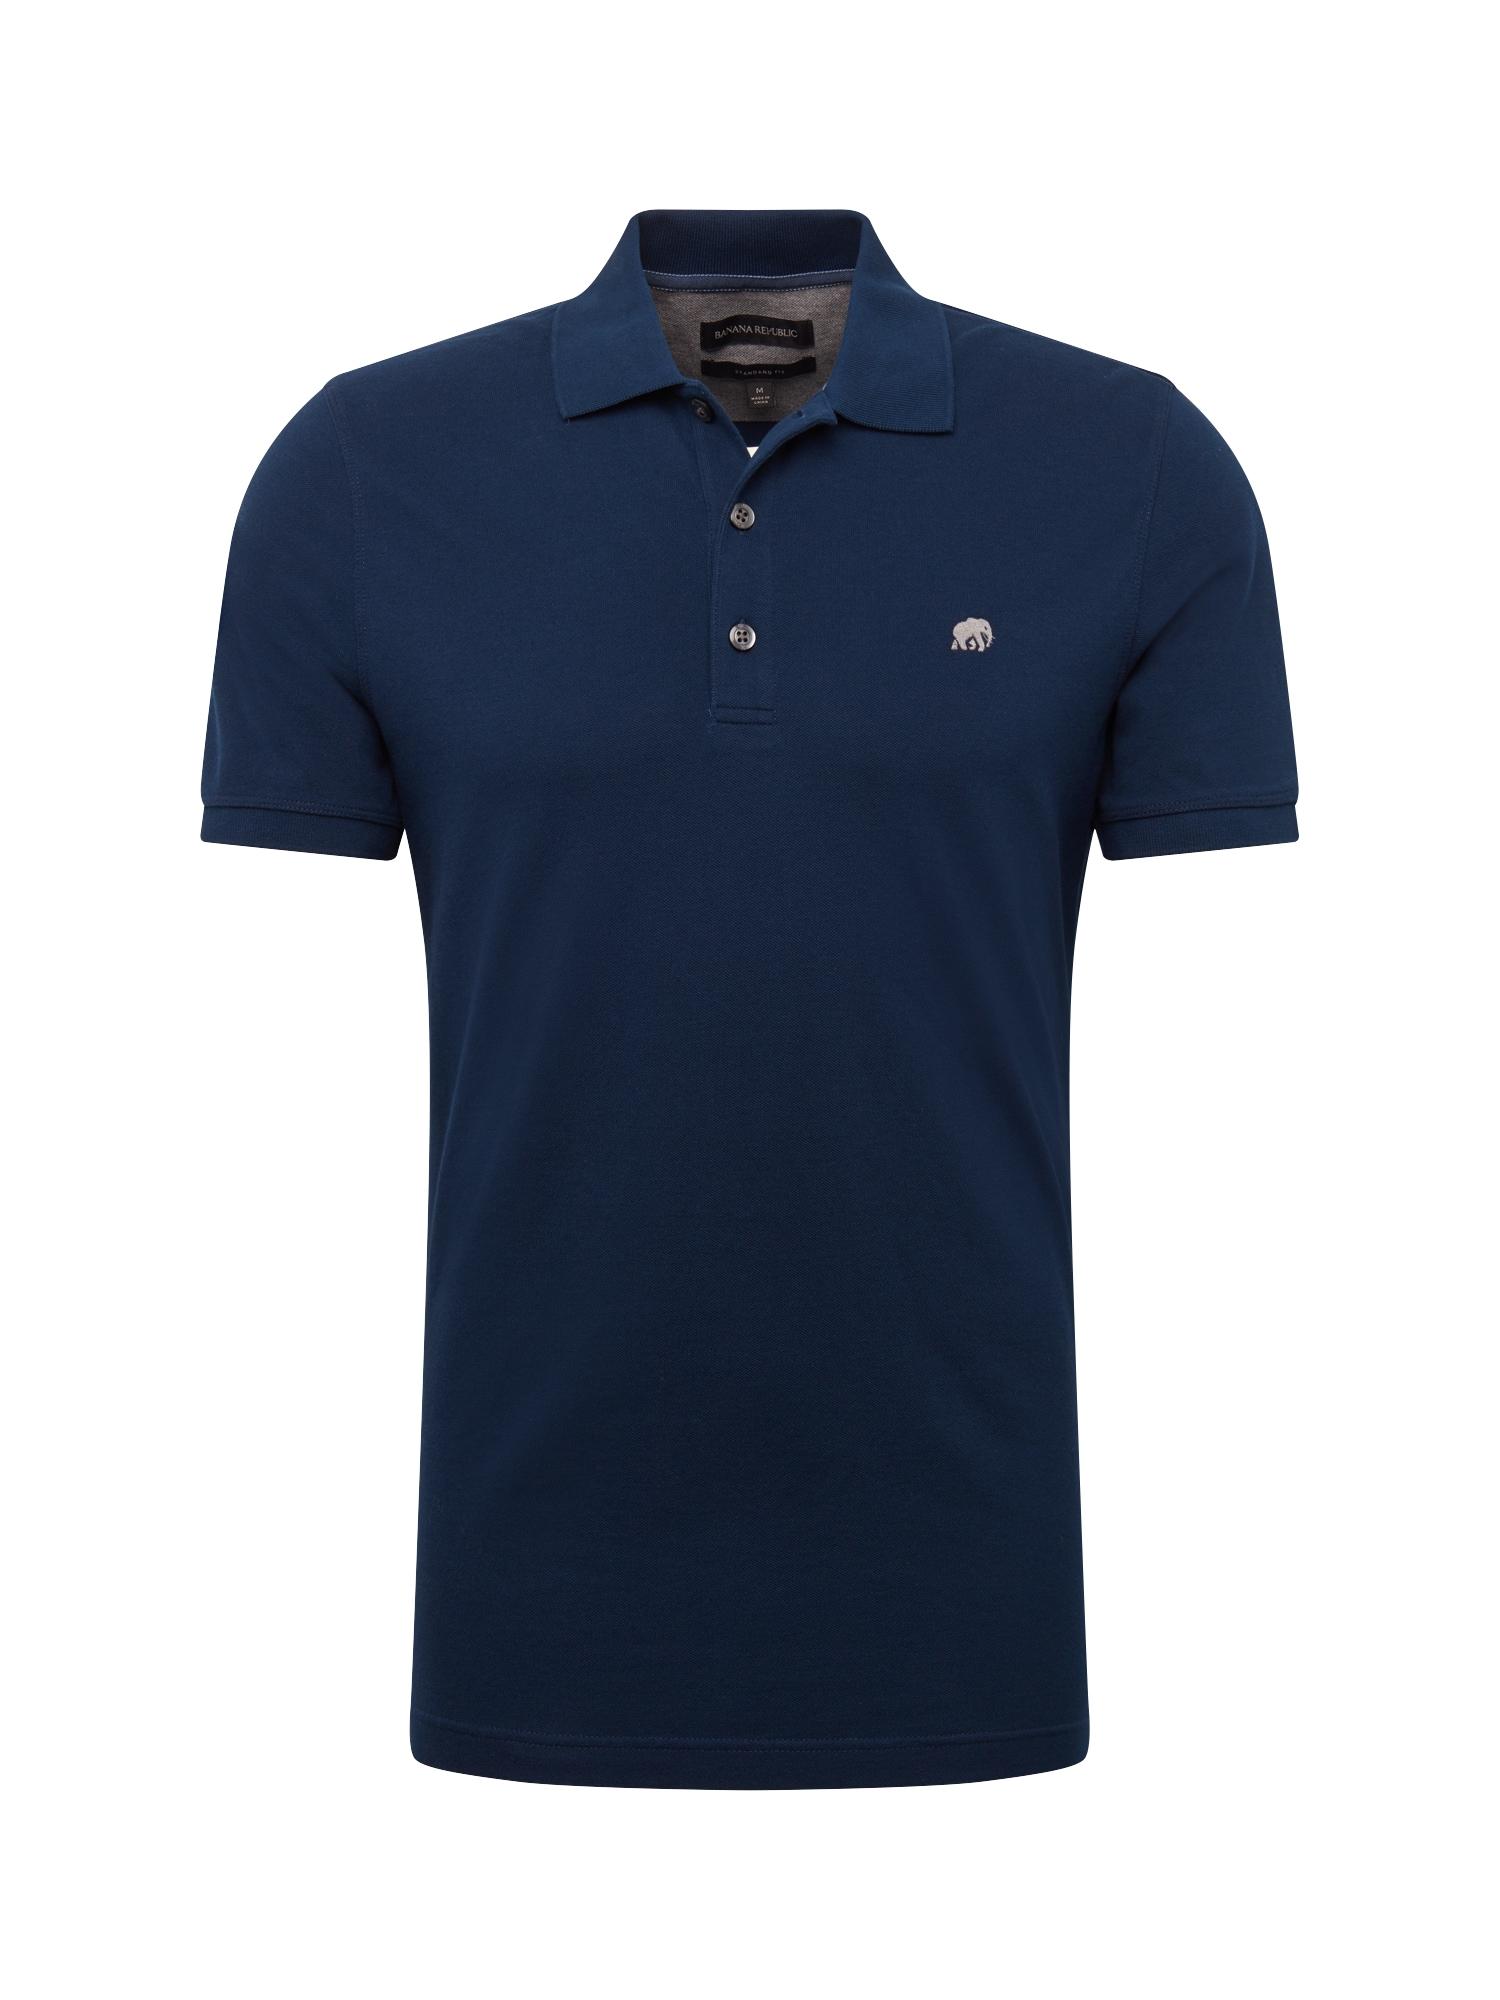 Tričko ST Branded Pique Polo Basics námořnická modř Banana Republic